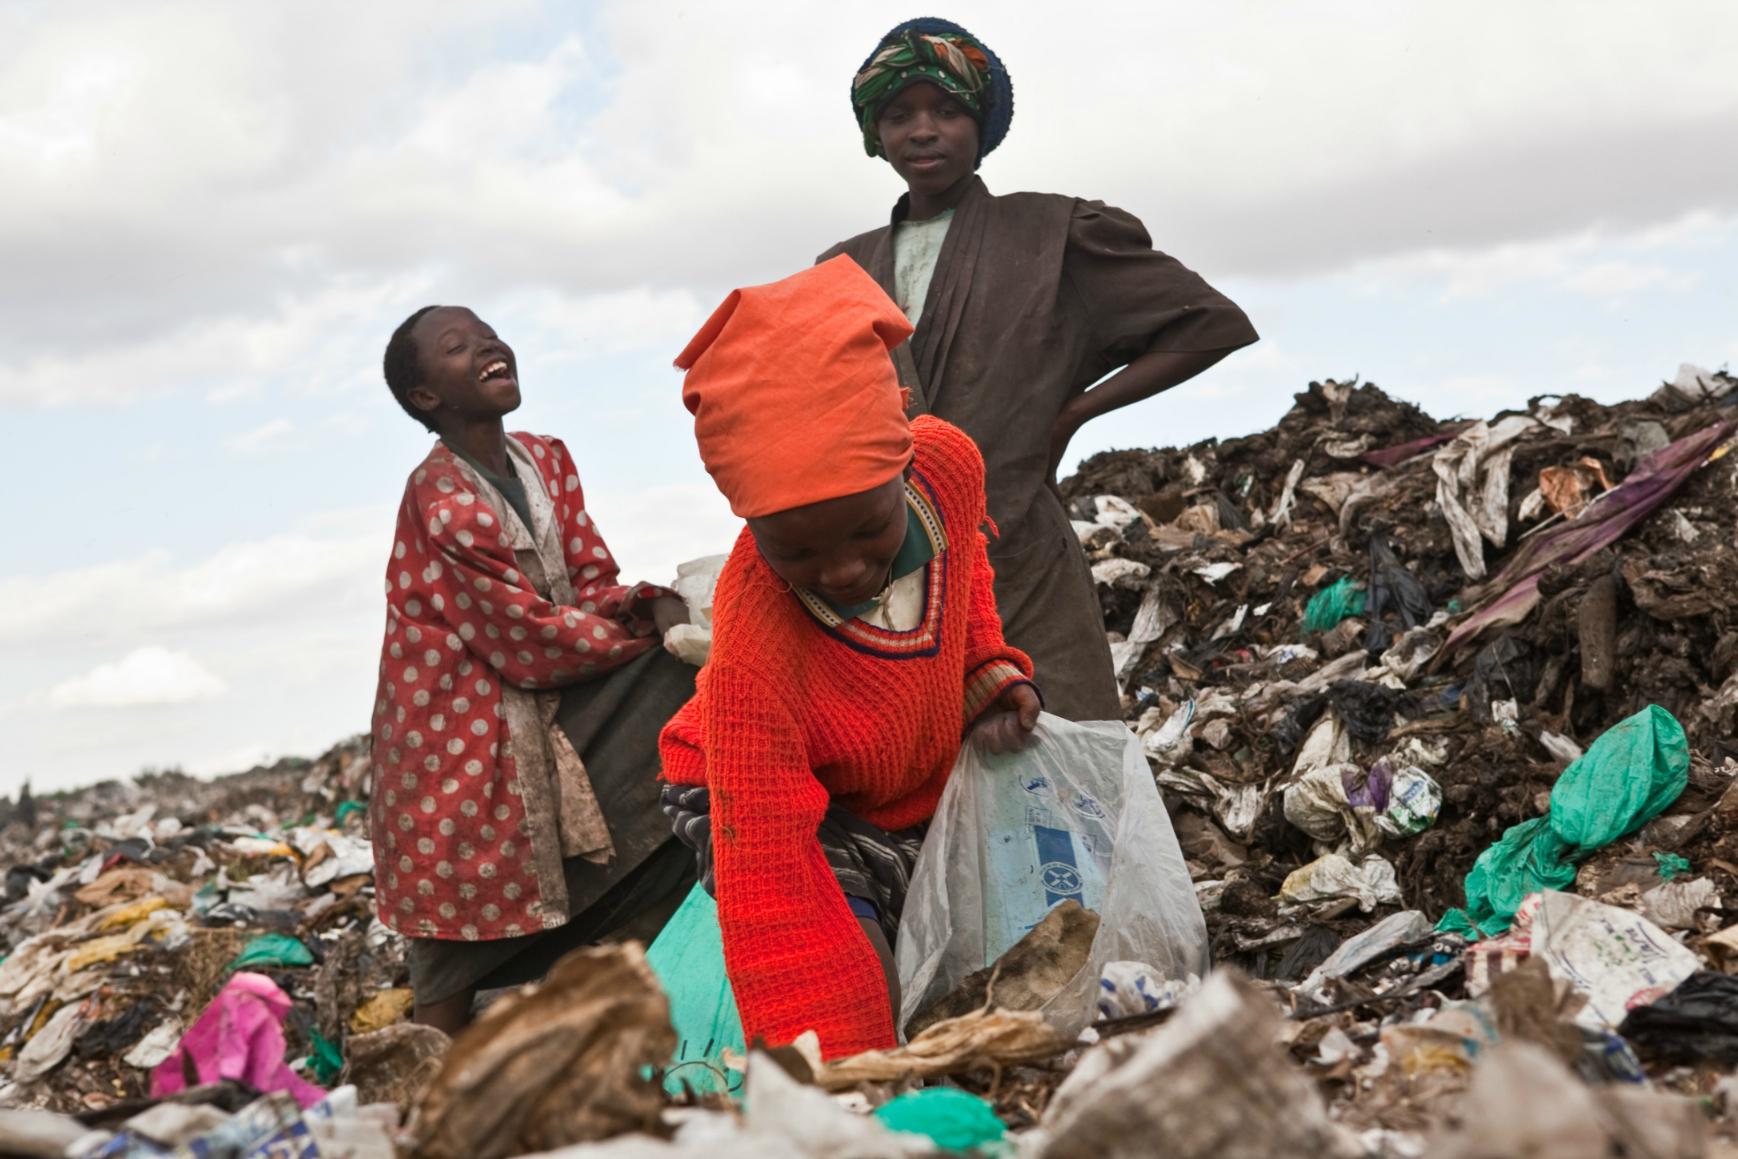 Dandora dump site in Nairobi, Kenya. Image:brendanbannon.com